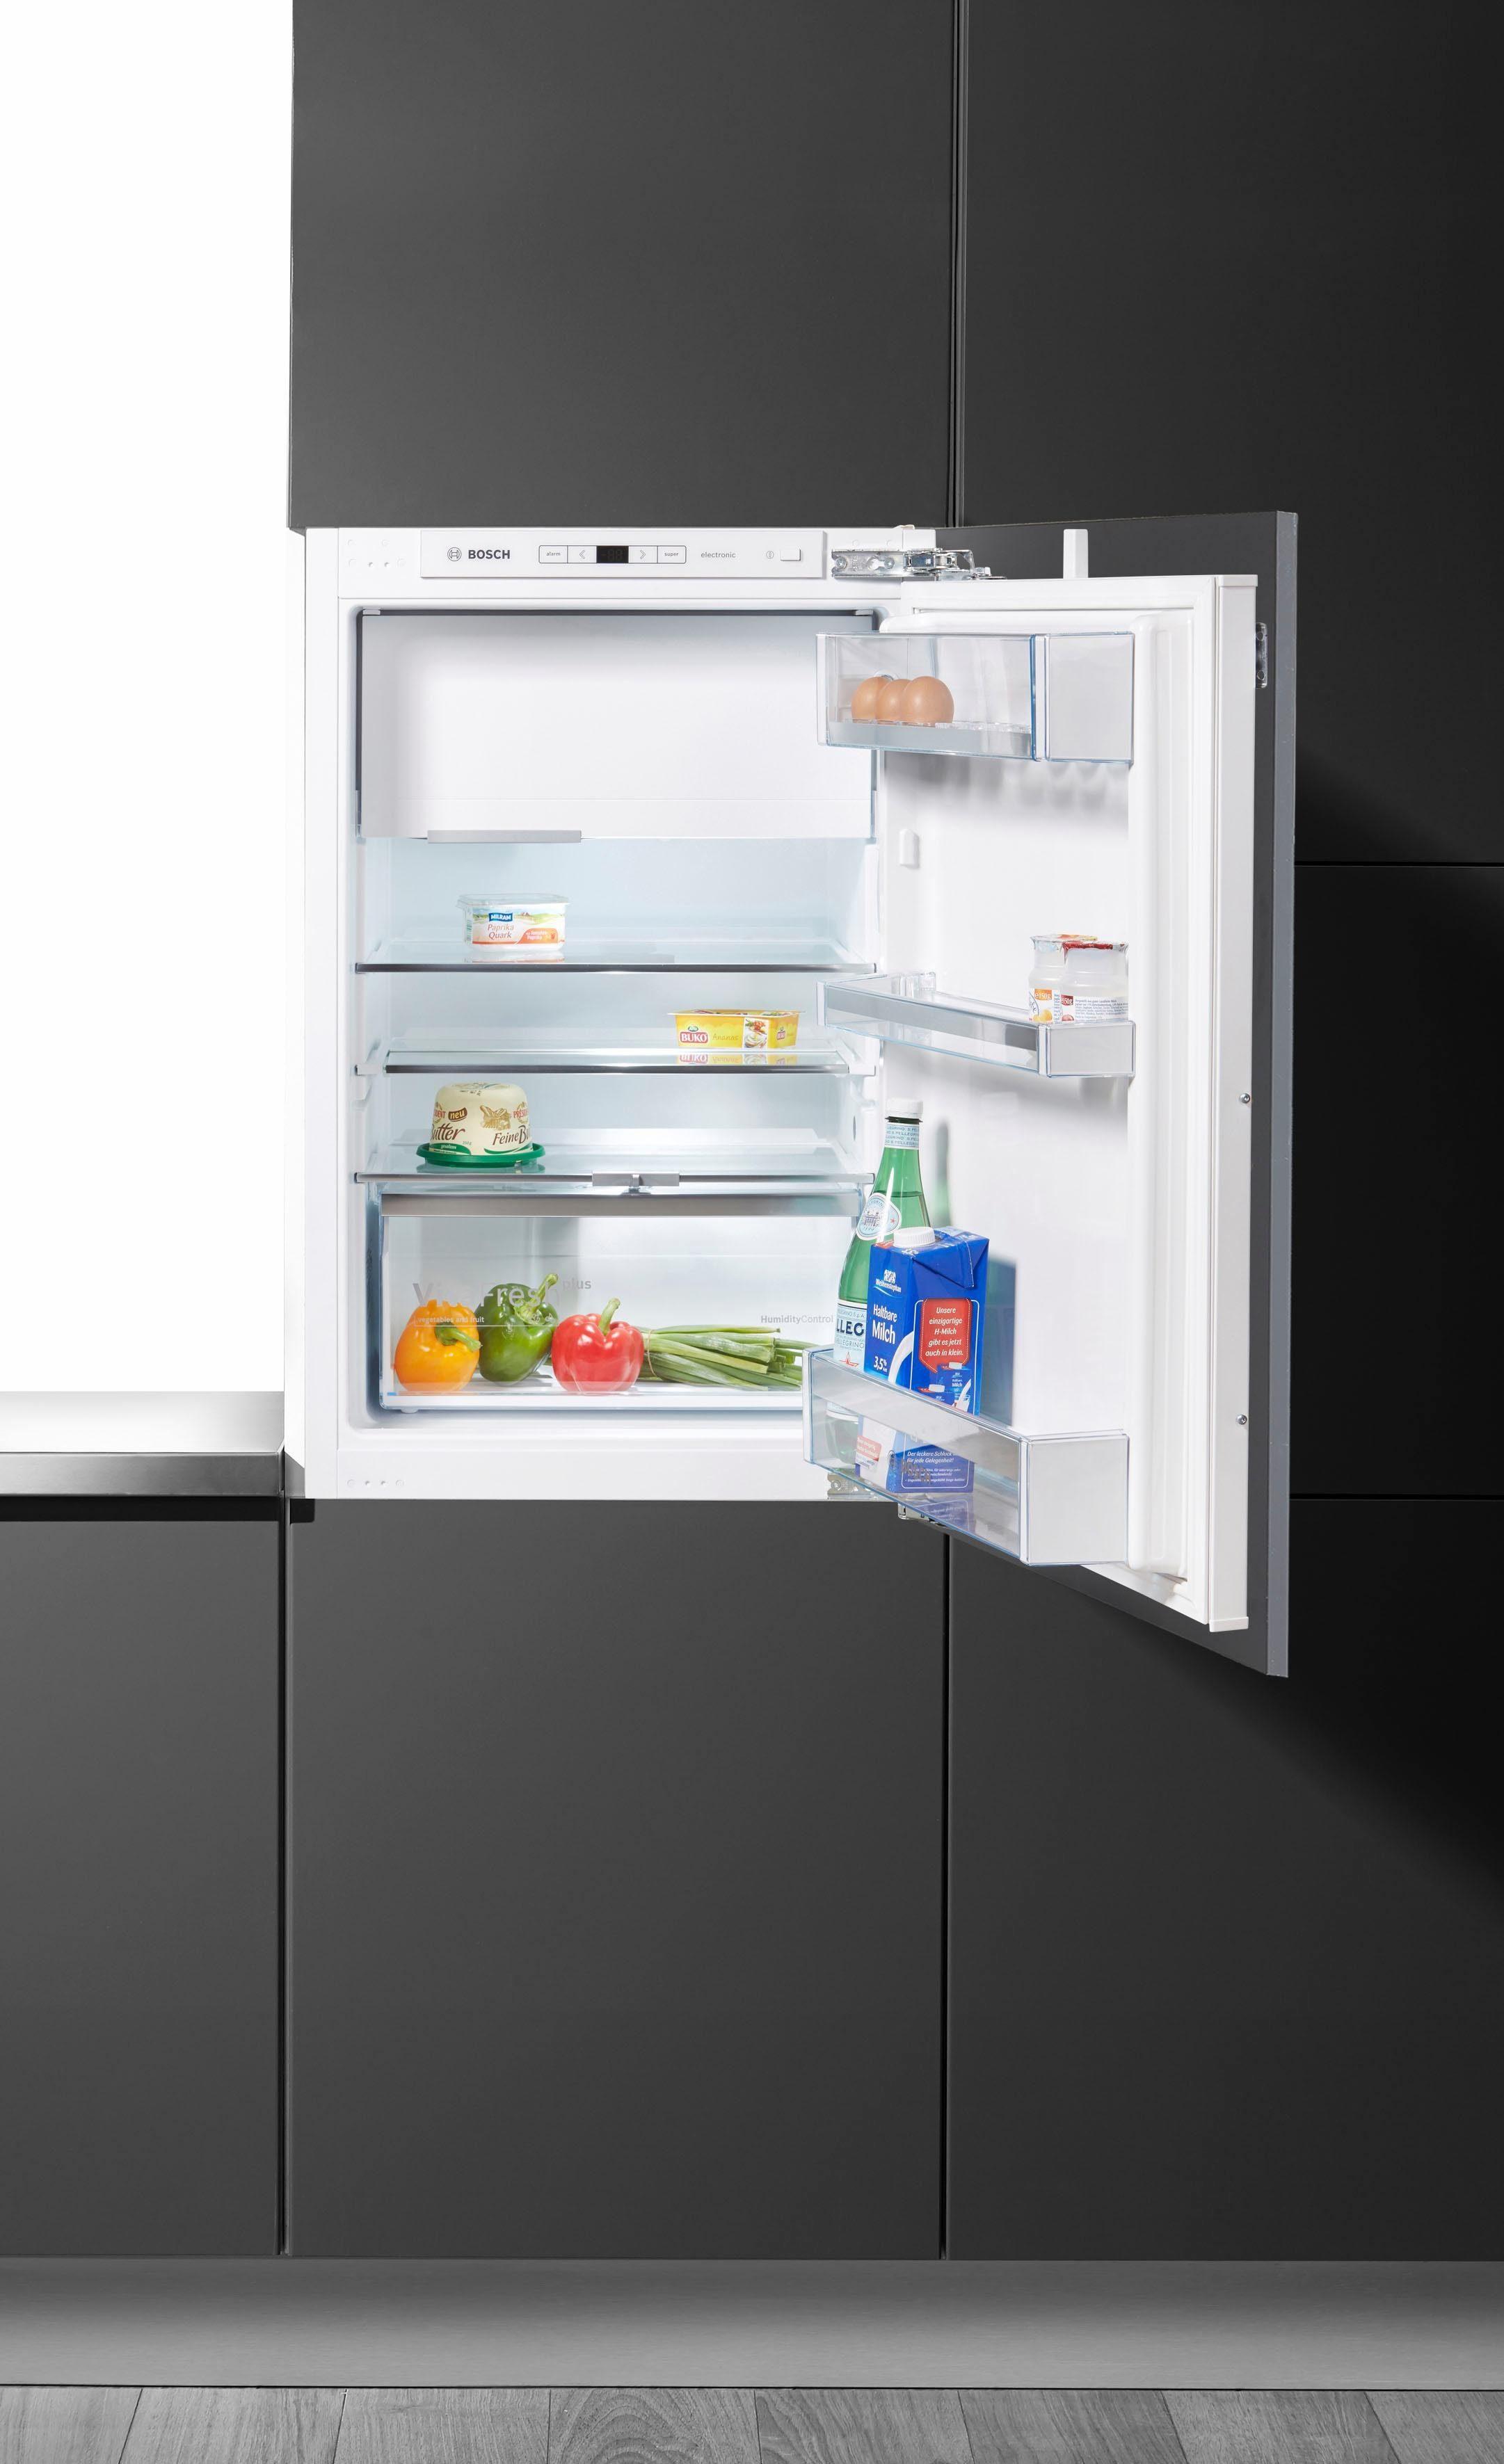 BOSCH Einbaukühlschrank KIL22AF30, 87,4 cm hoch, 55,8 cm breit, A++, 87,4 cm